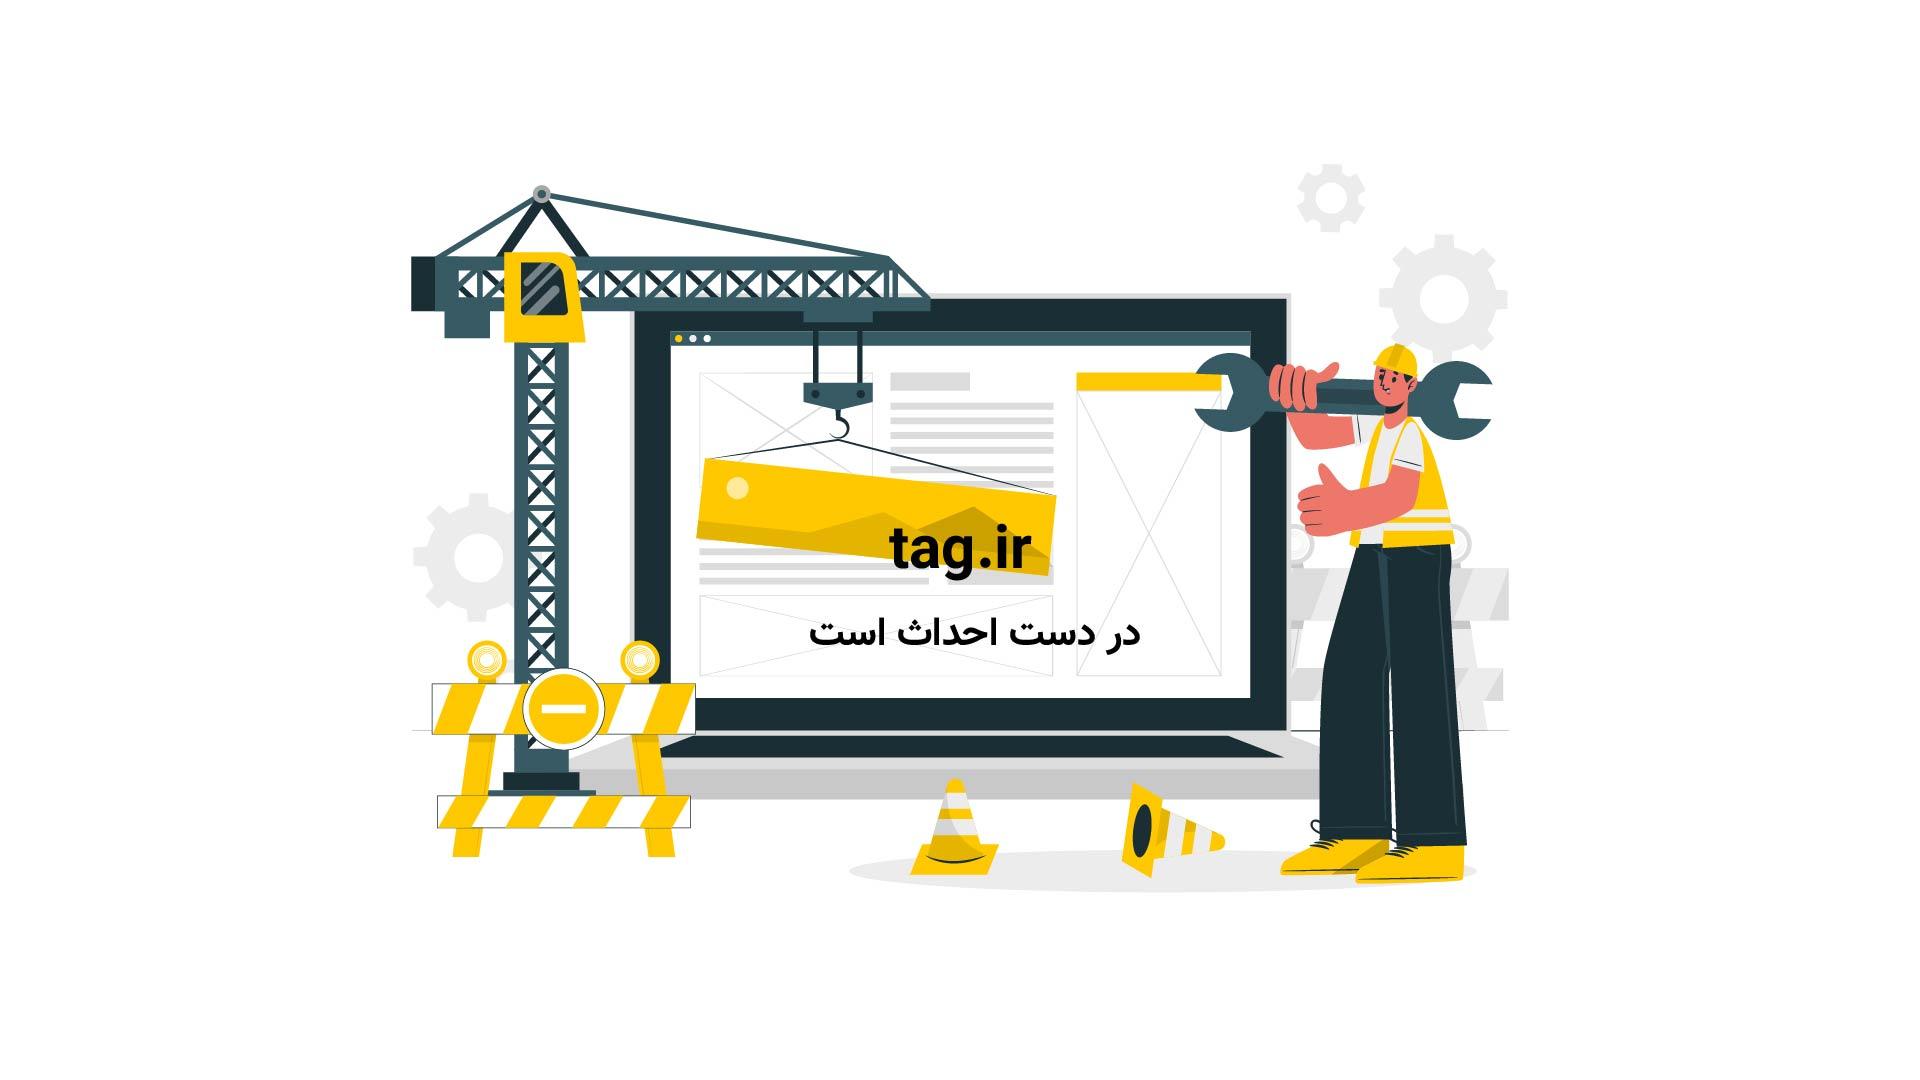 کاپ کیک به شکل خرگوش |تگ